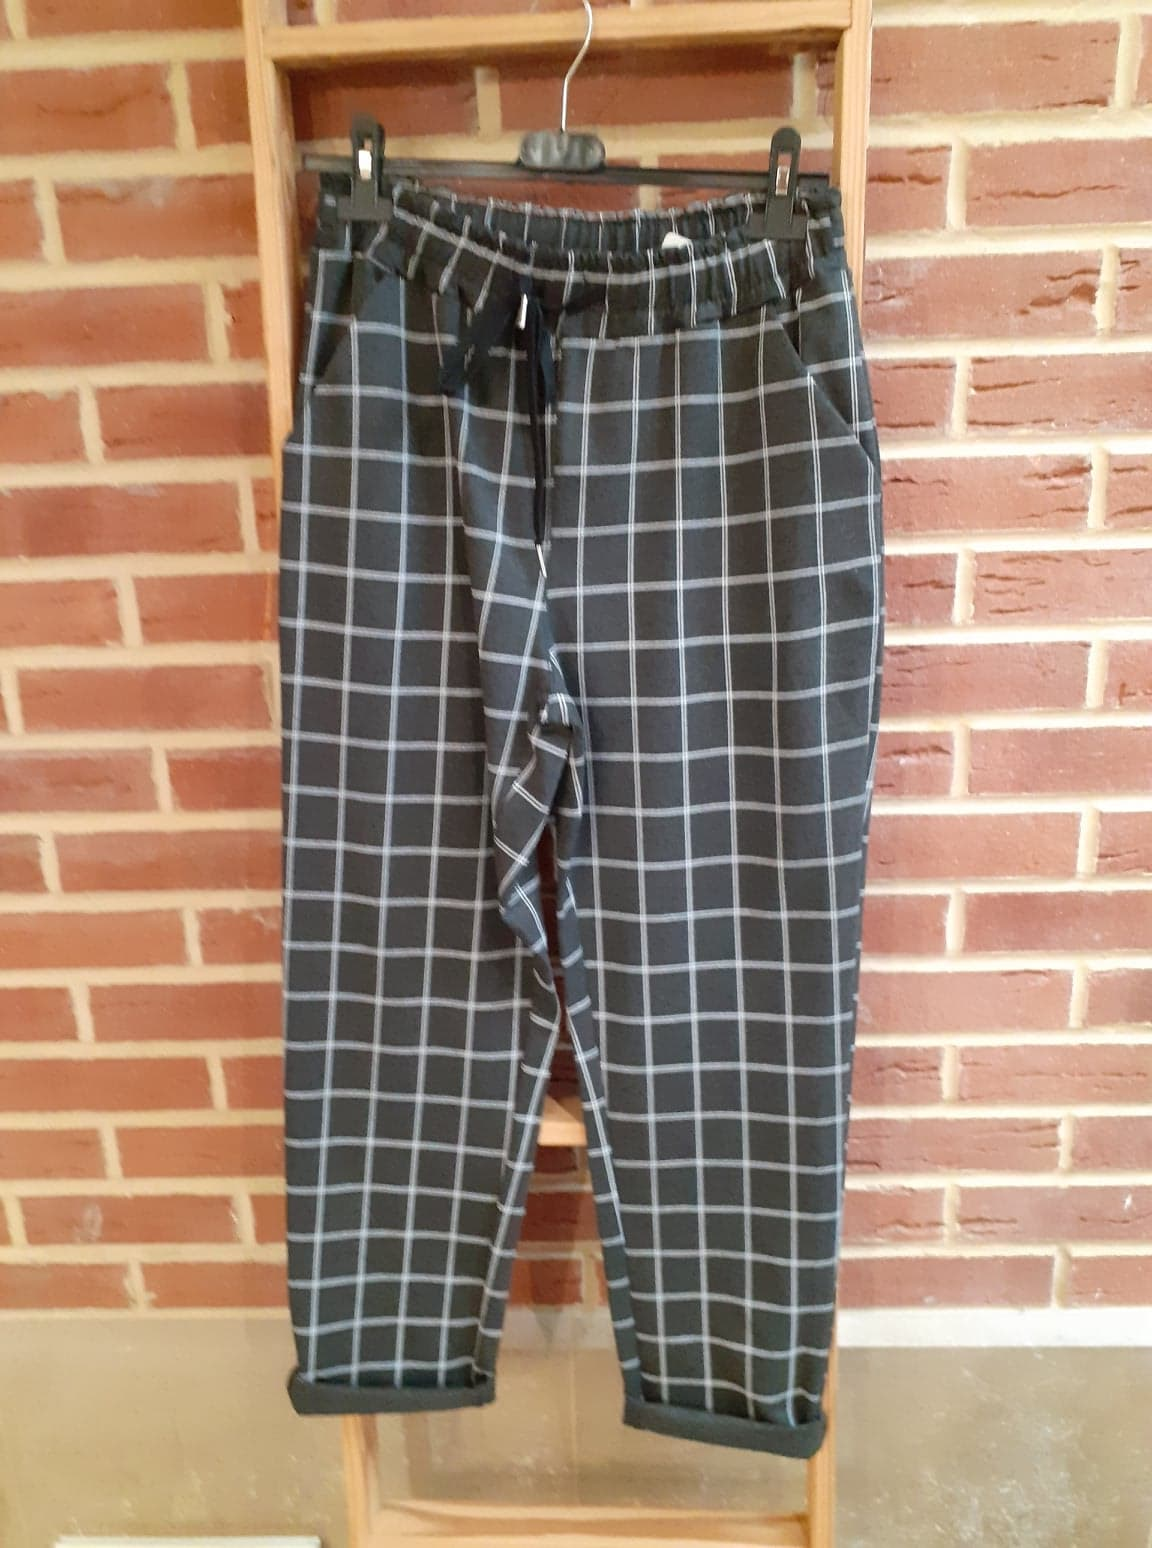 pantalon gris carreau blanc - pan-gri-car-bla